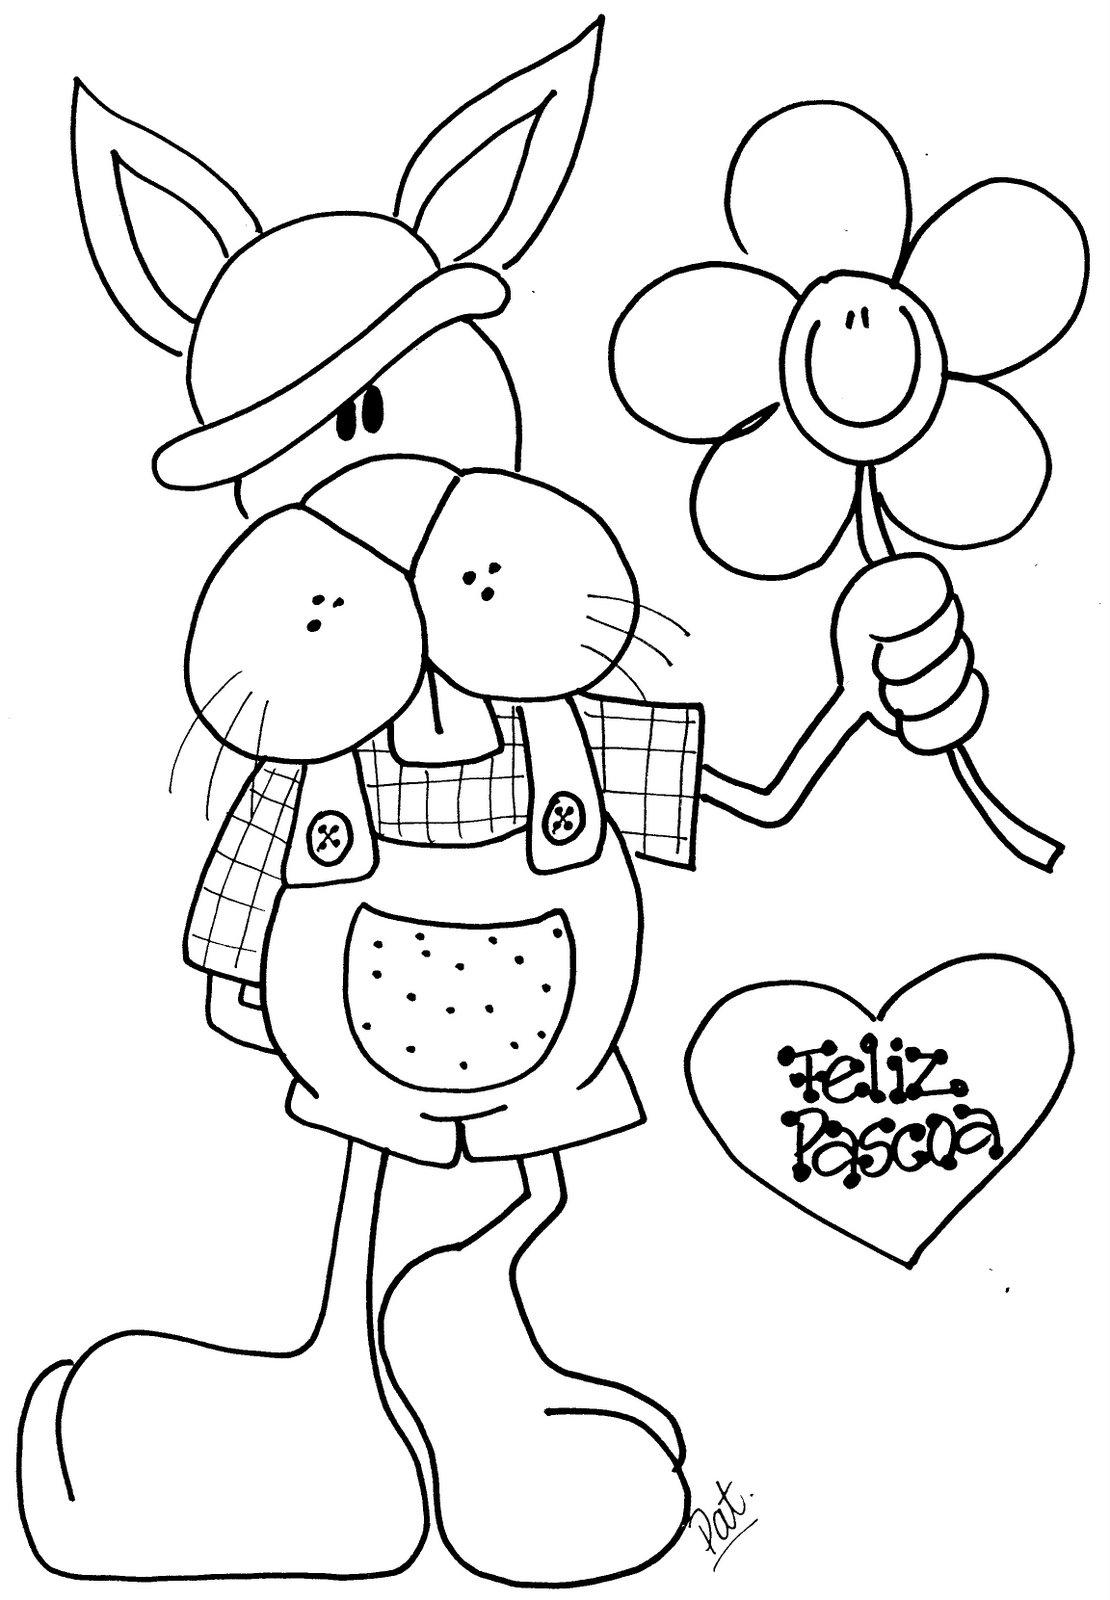 desenhos coelhinhos pintura pascoa imprimir colorir (2)